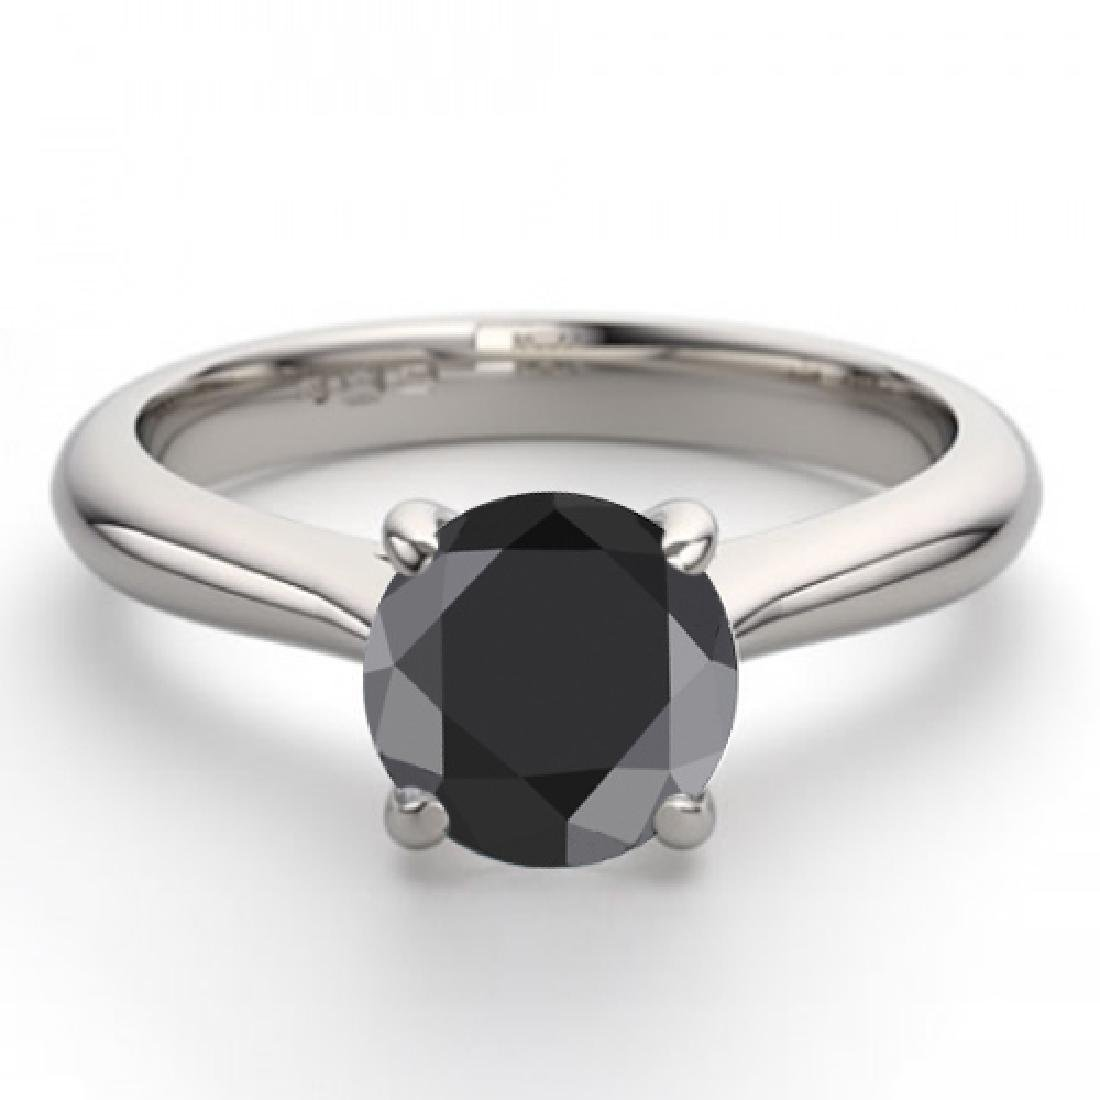 14K White Gold Jewelry 1.13 ctw Black Diamond Solitaire